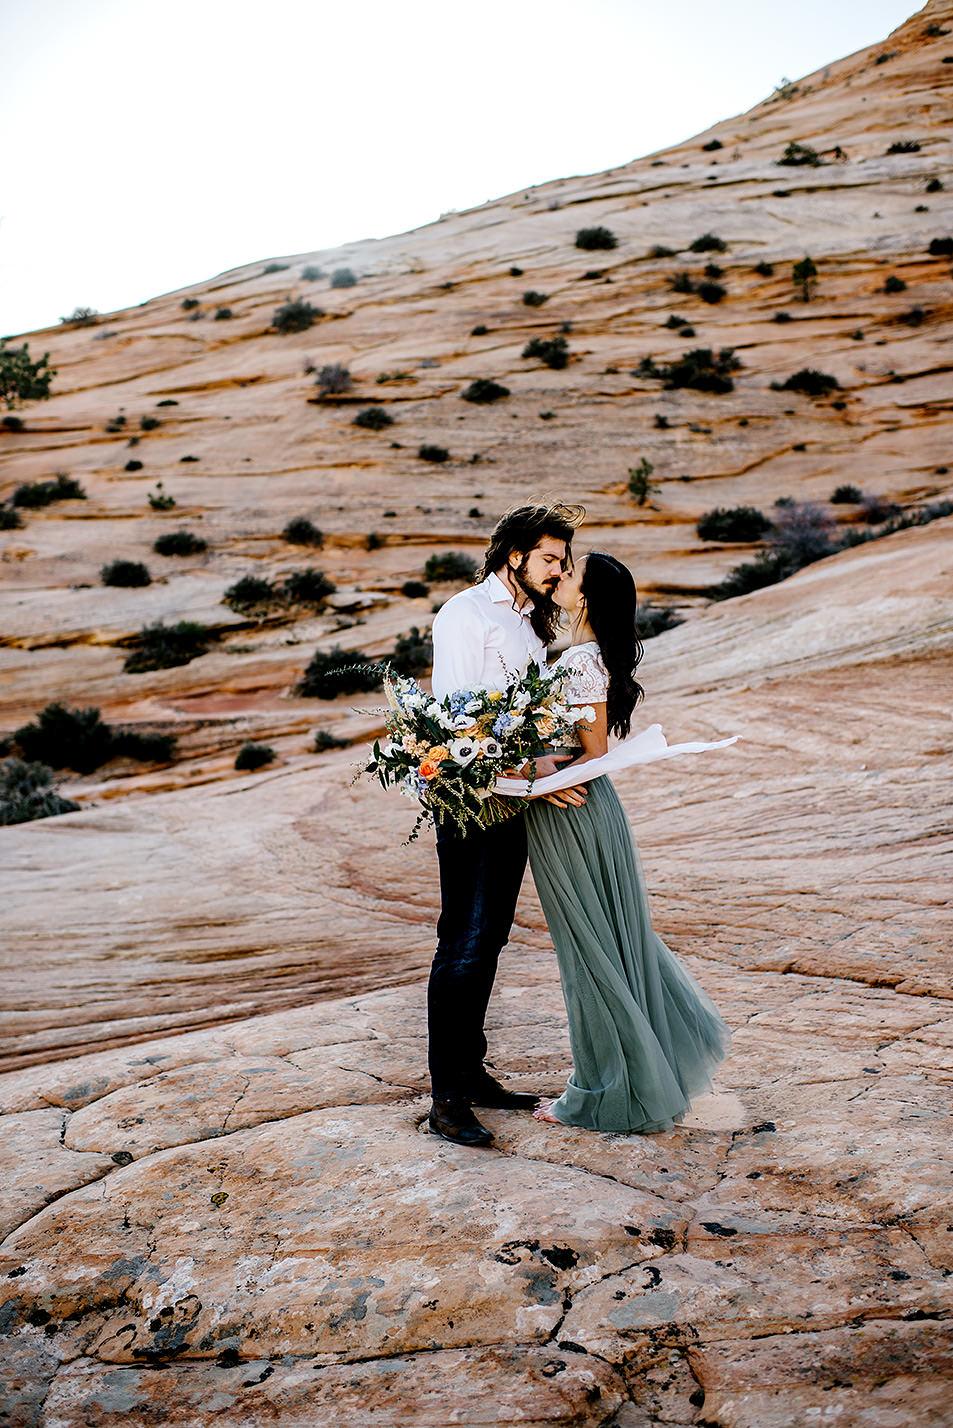 Zion_National_Park_Arizona_Wedding_Photographer_001.jpg